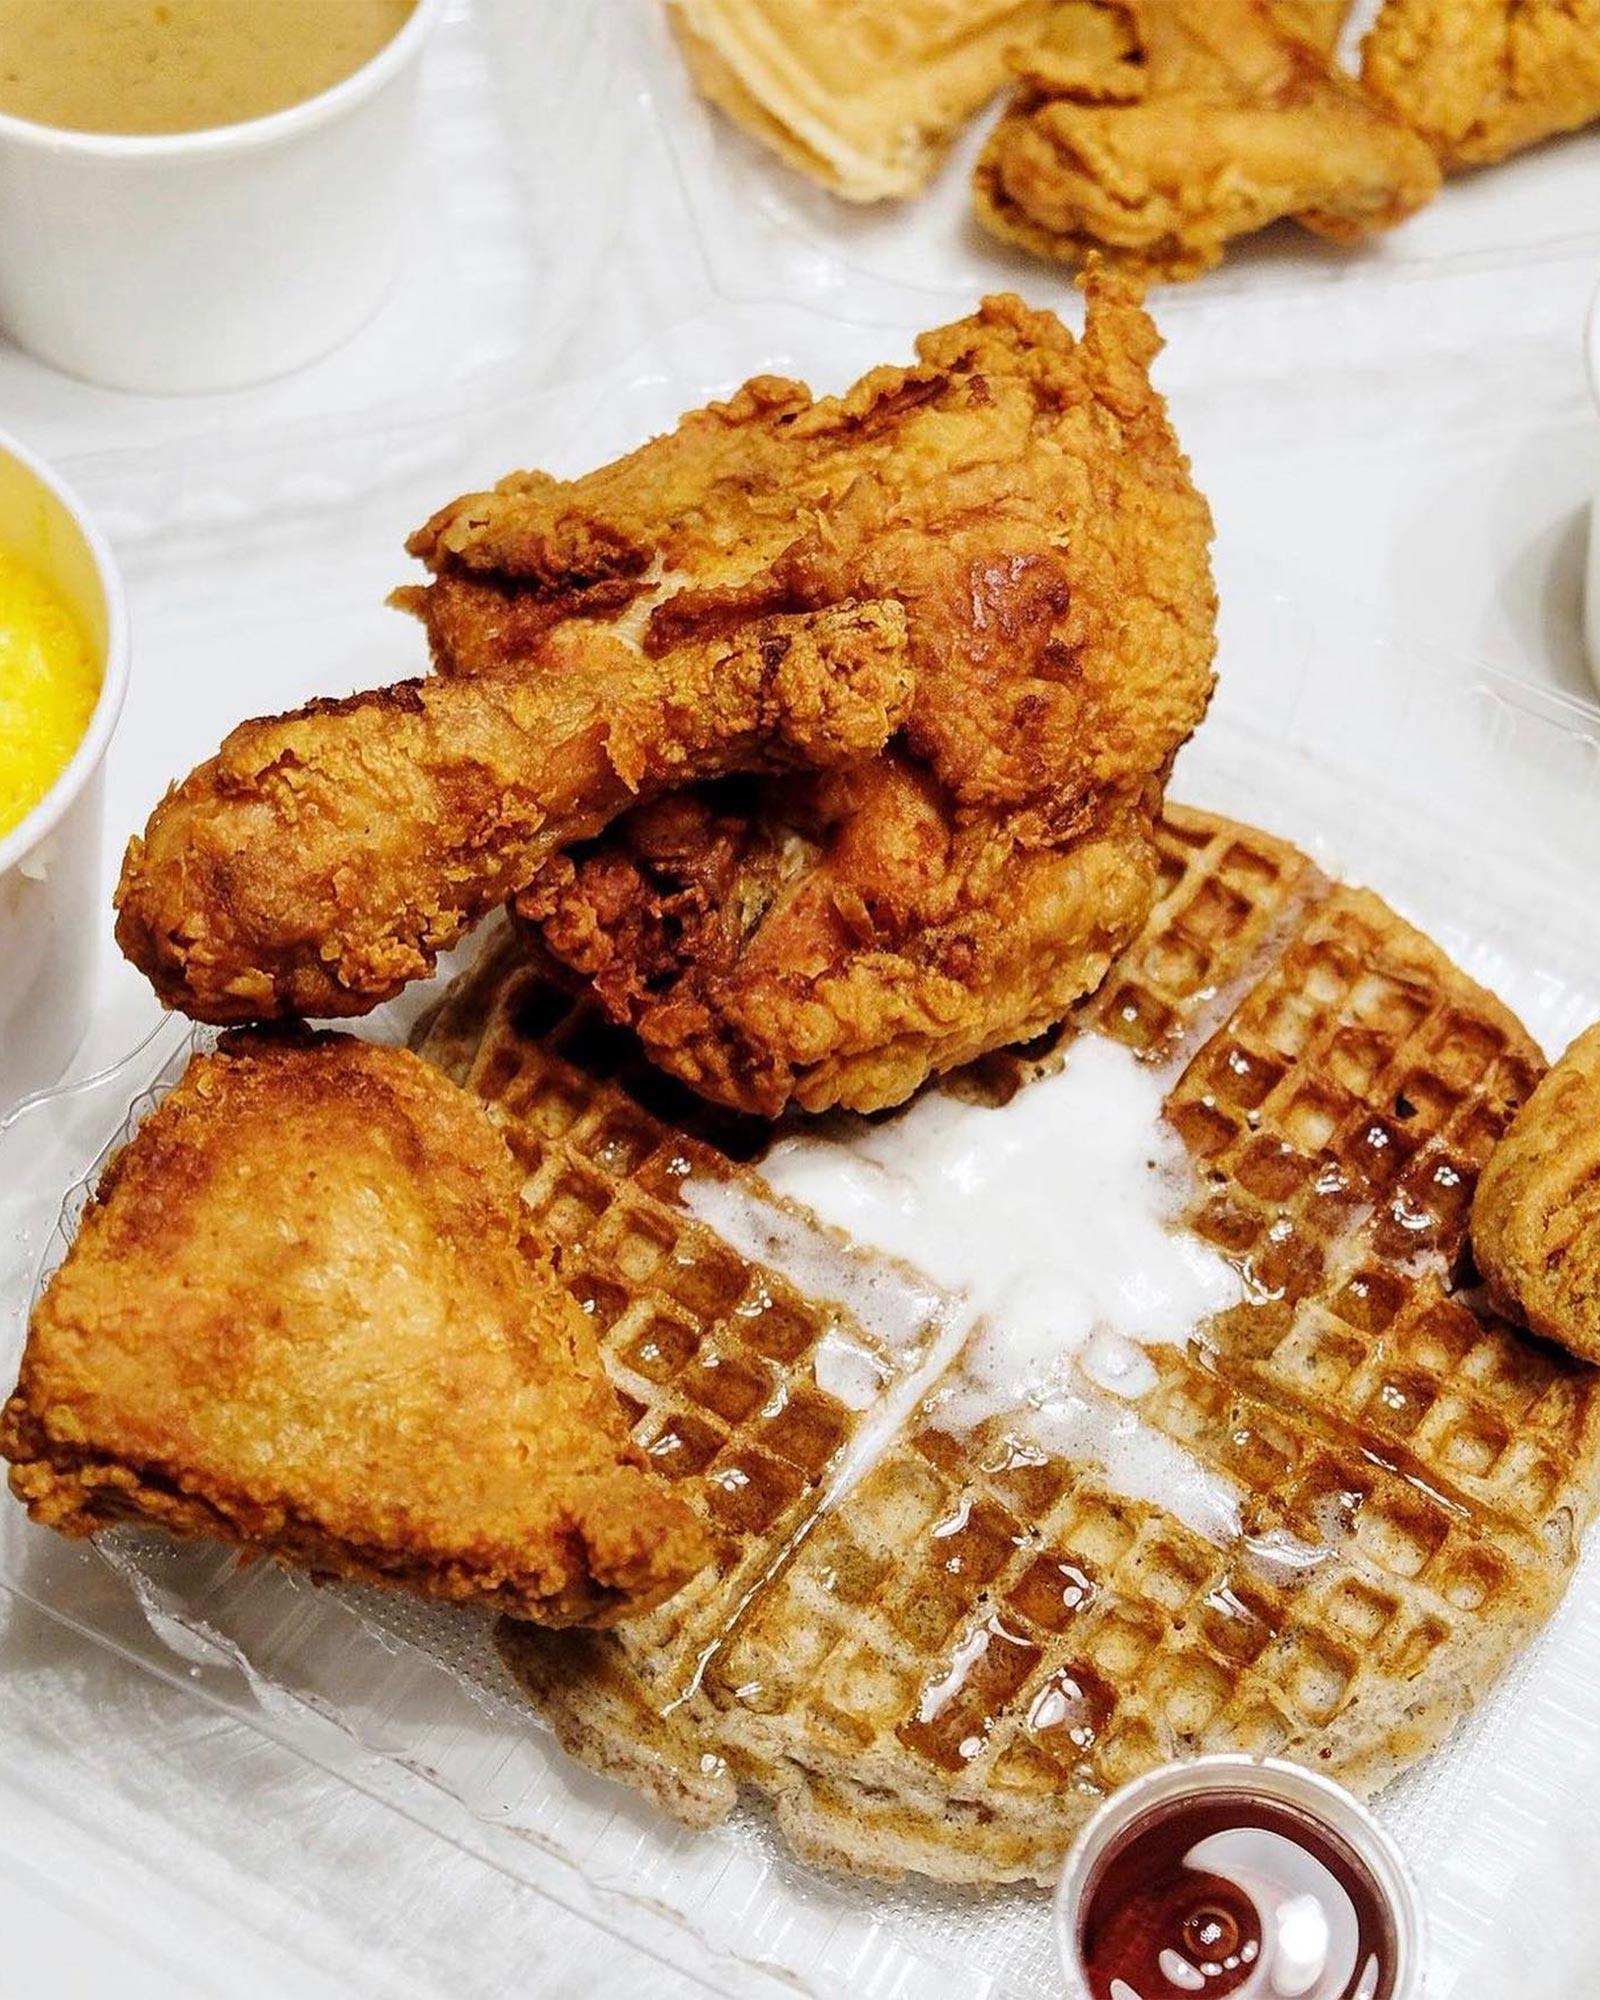 Roscoe's Chicken & Waffles (Hollywood)